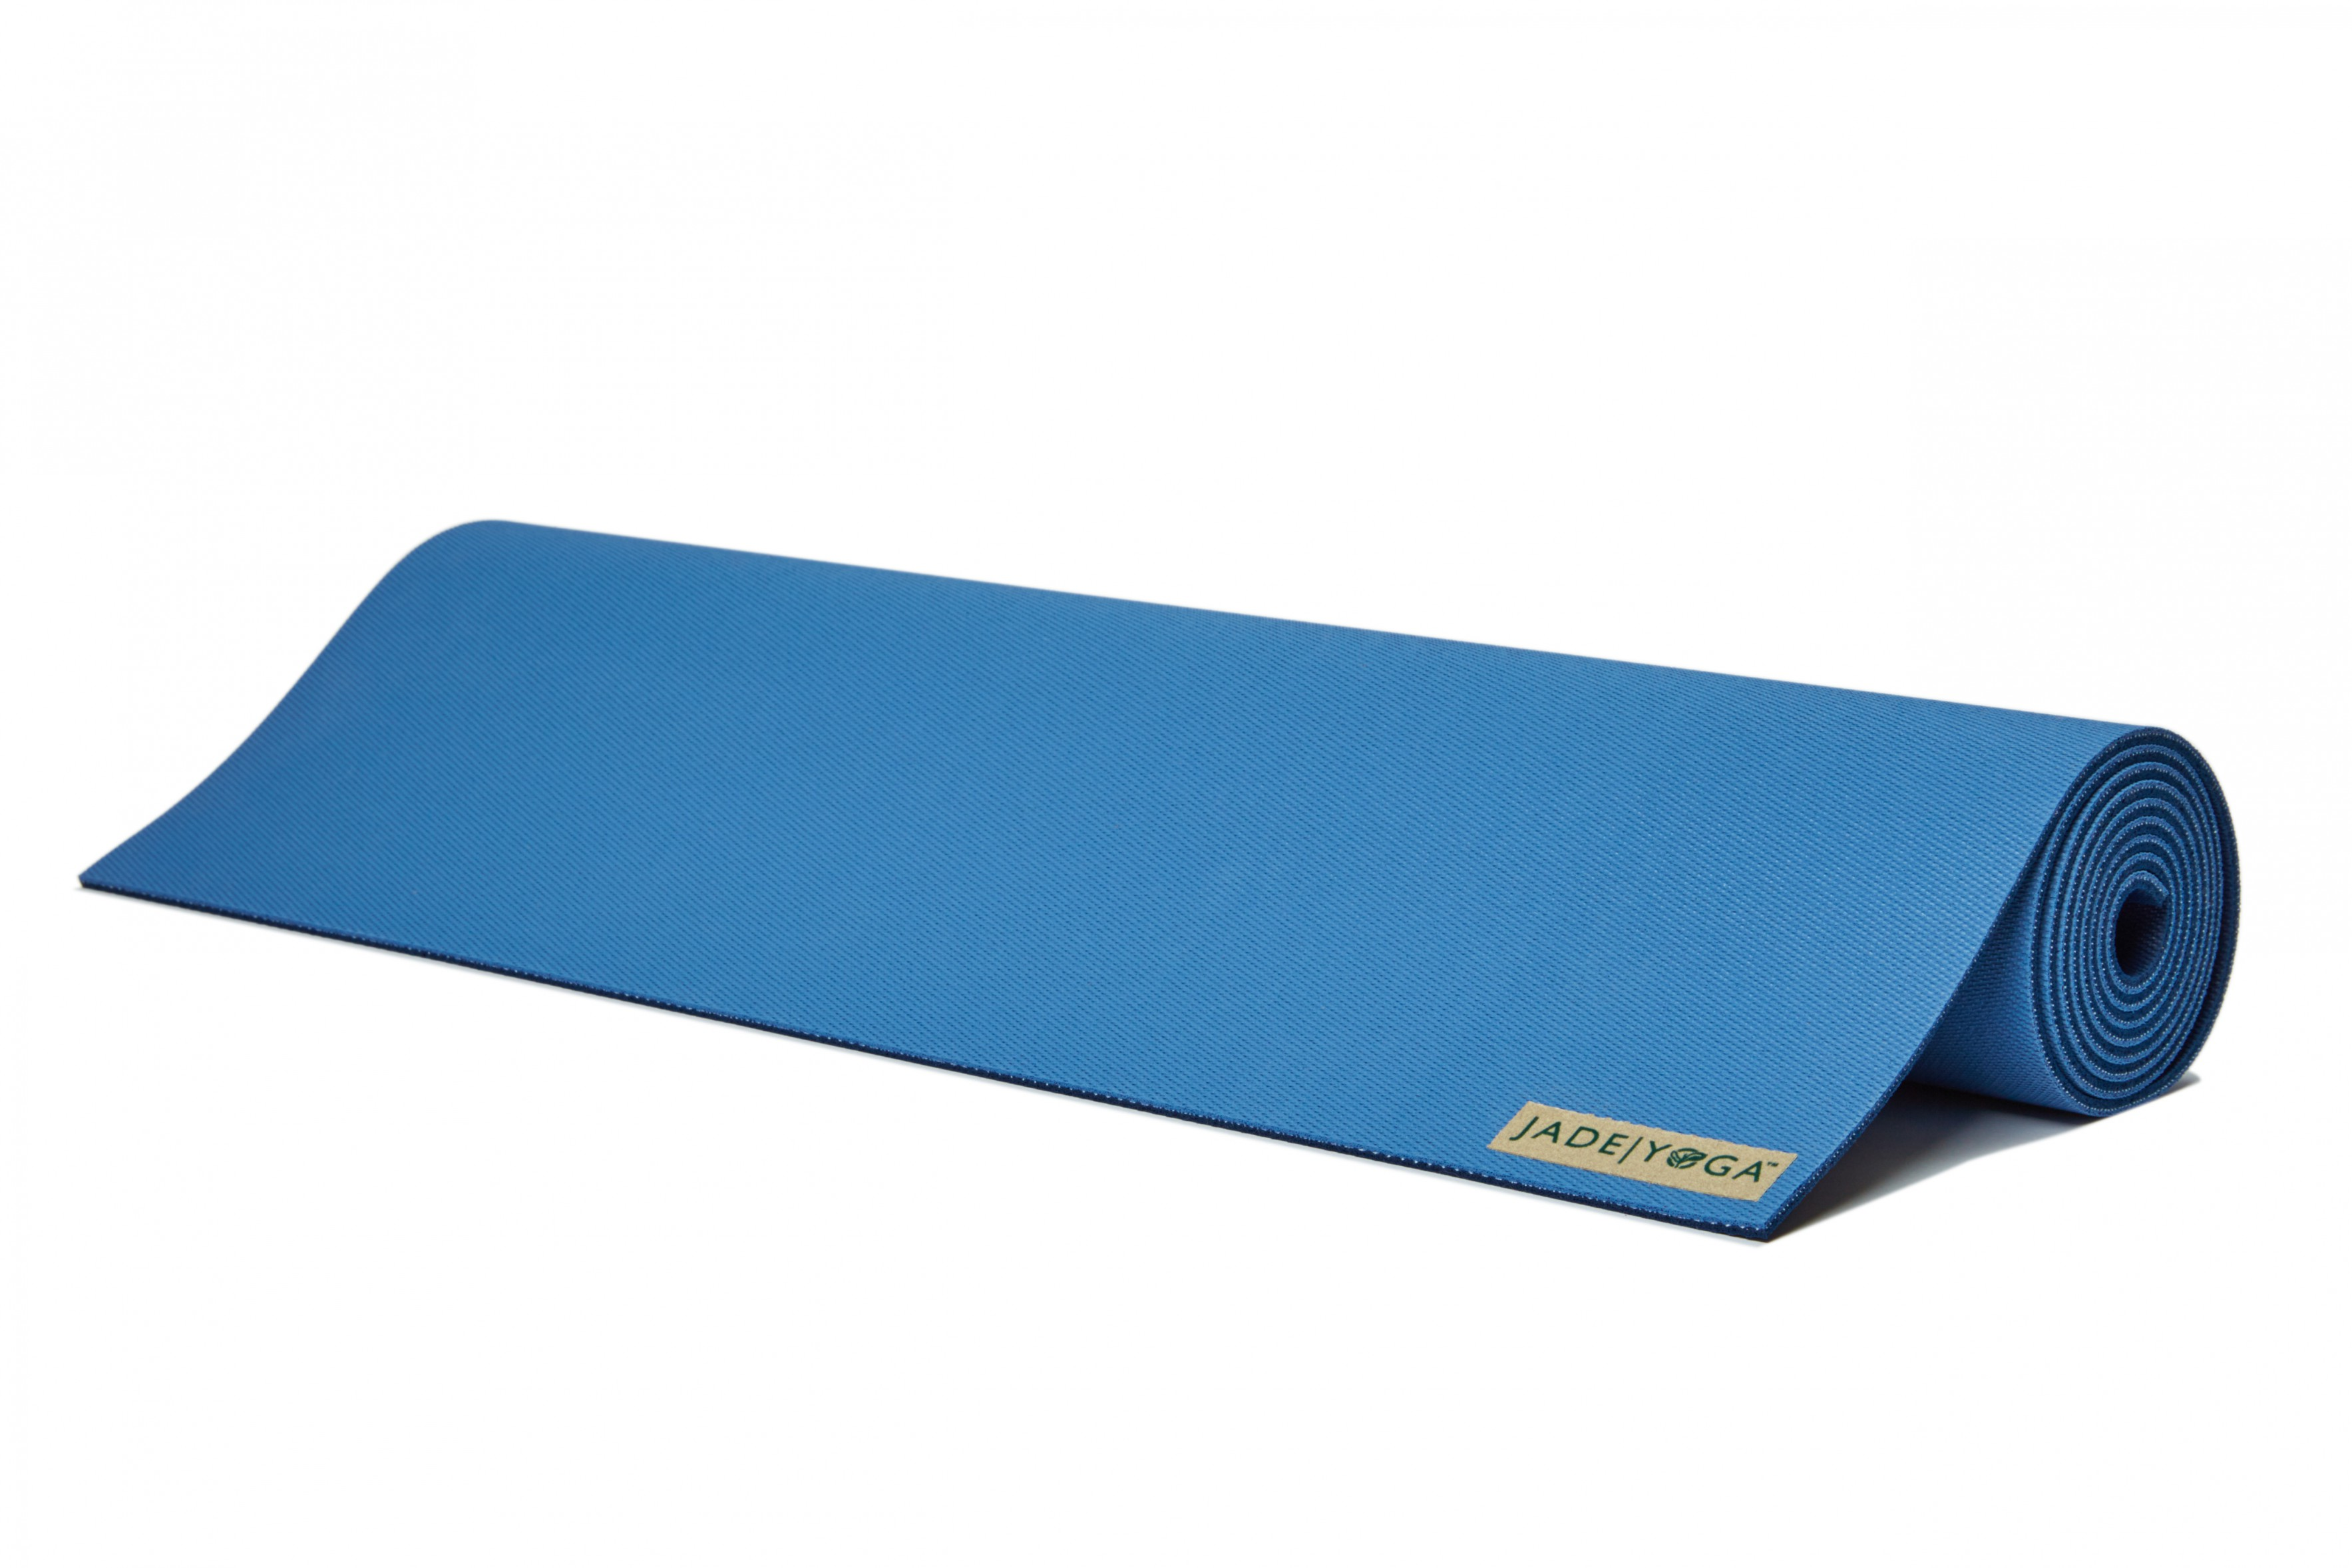 mats of and kate cons pros top img yoga the goodyear living spiritual harmony jade mat